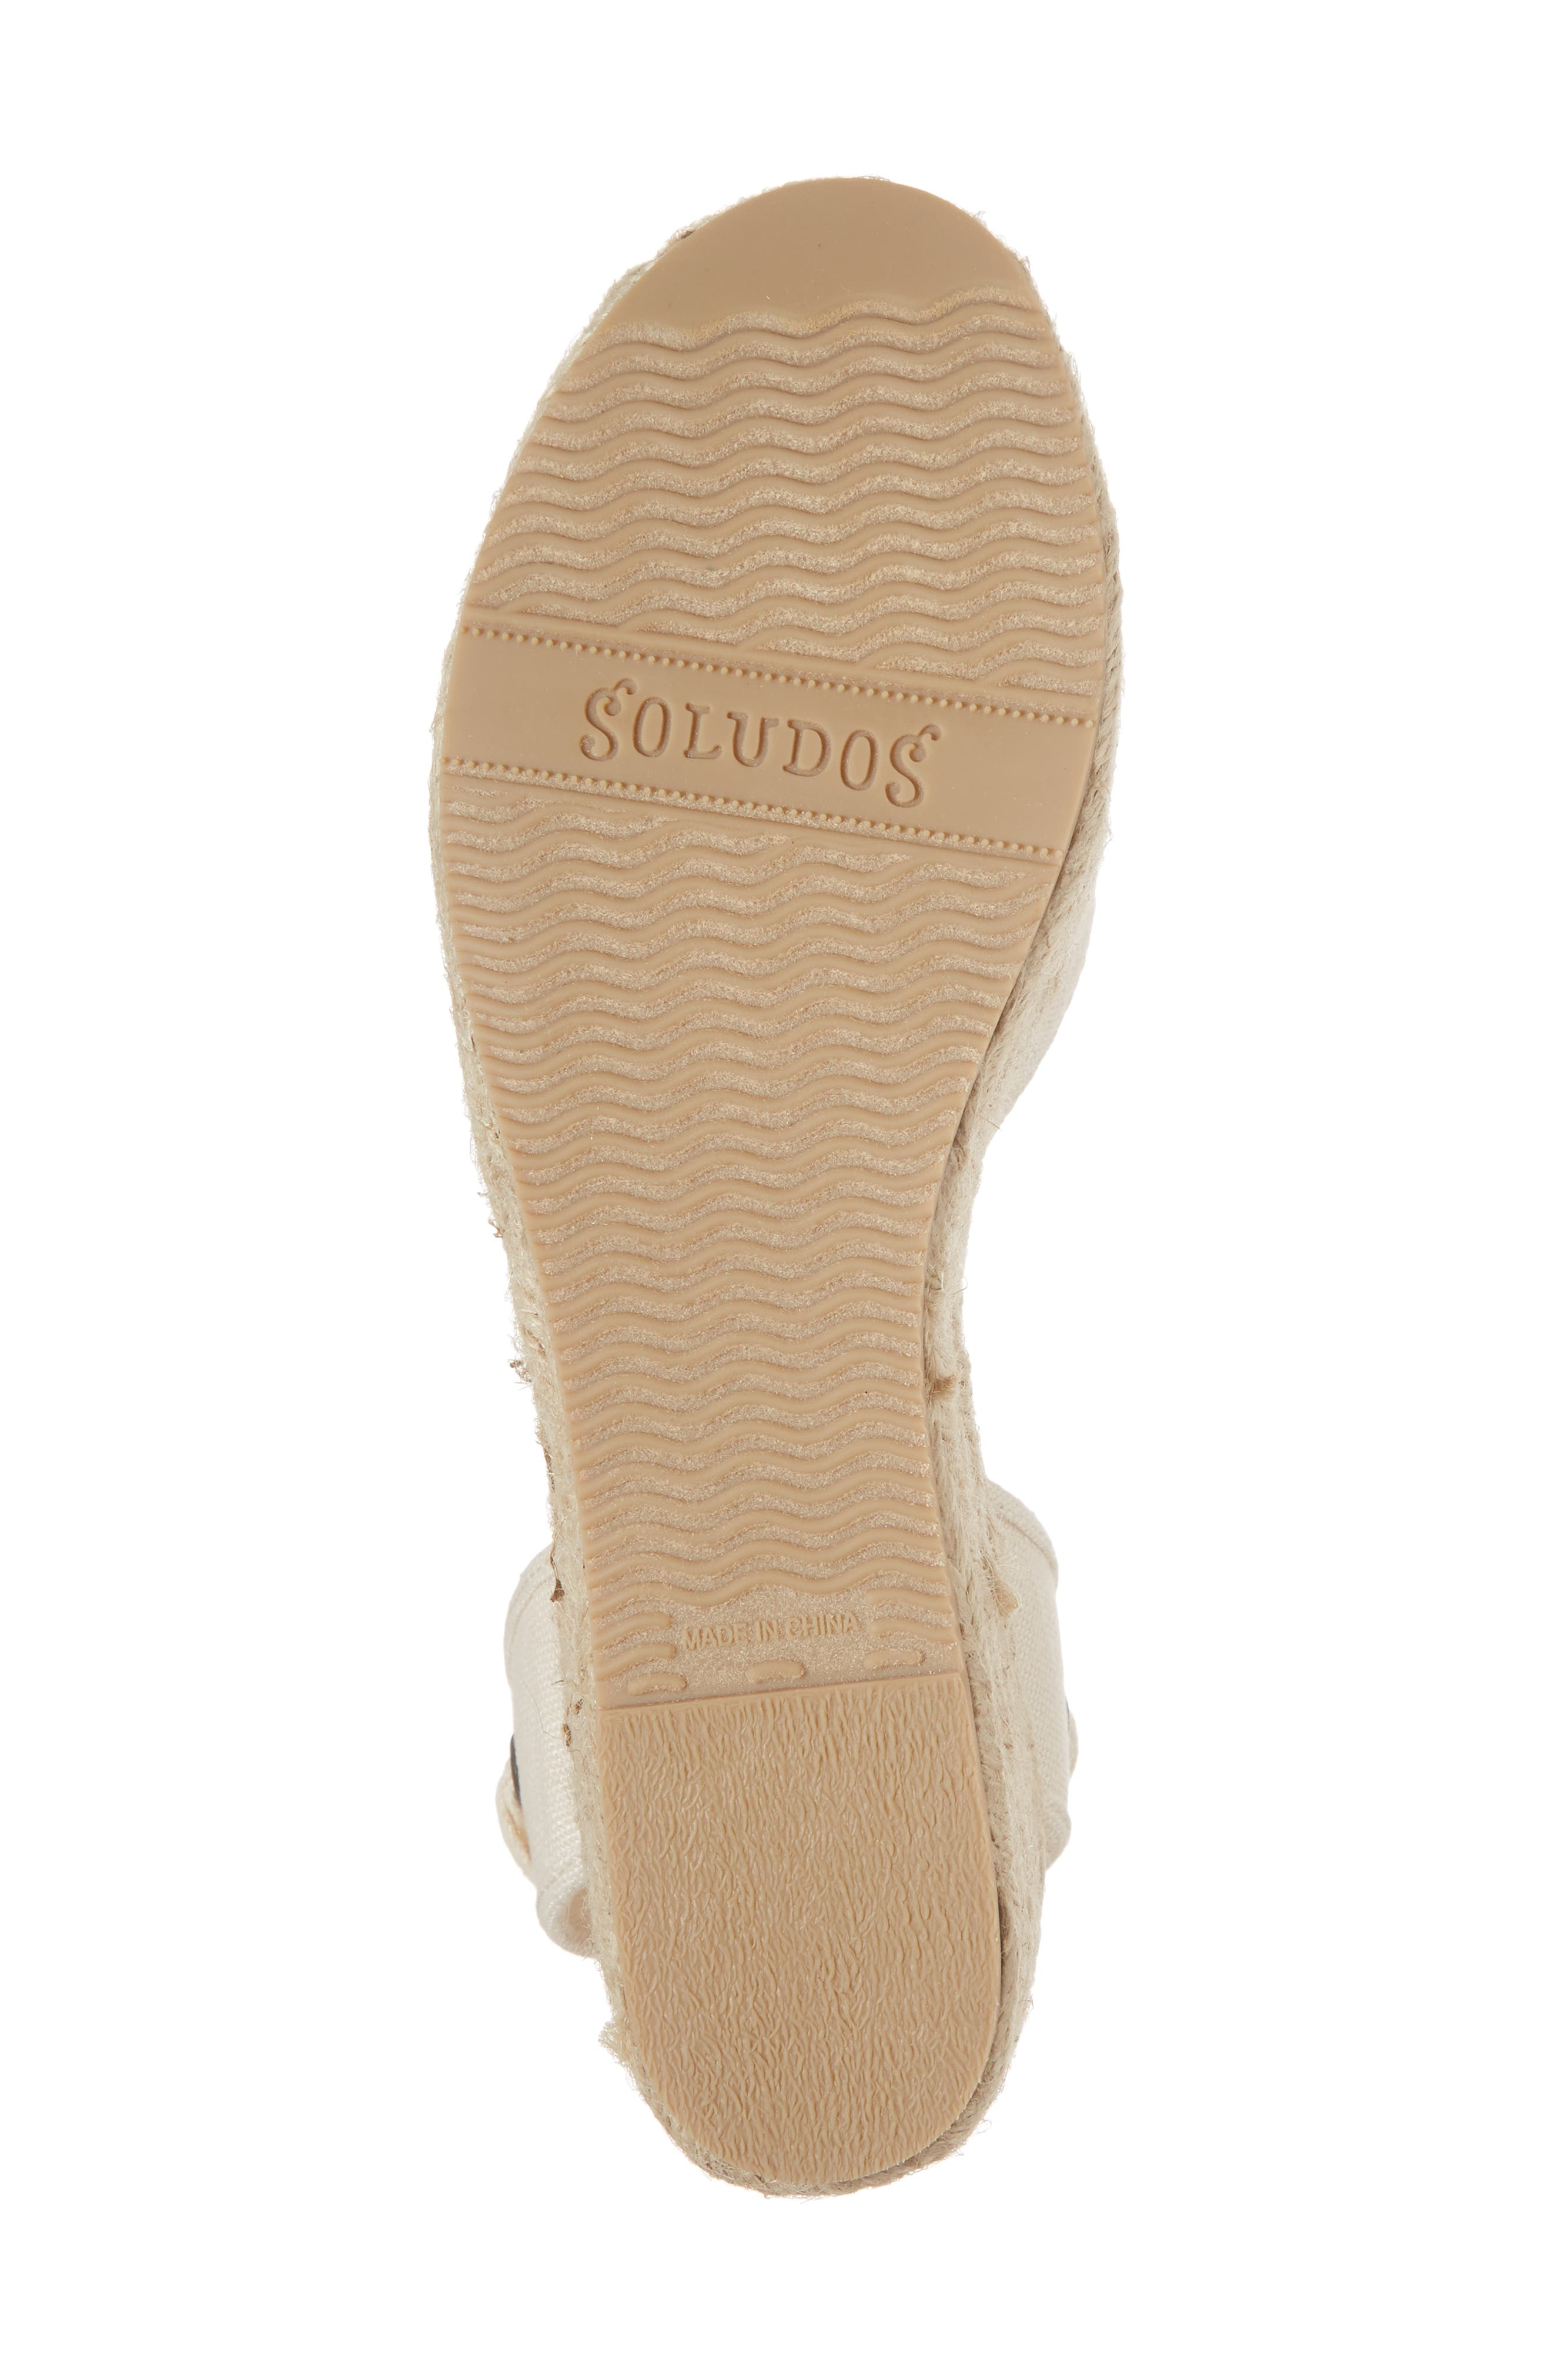 Espadrille Platform Sandal,                             Alternate thumbnail 6, color,                             Blush Fabric